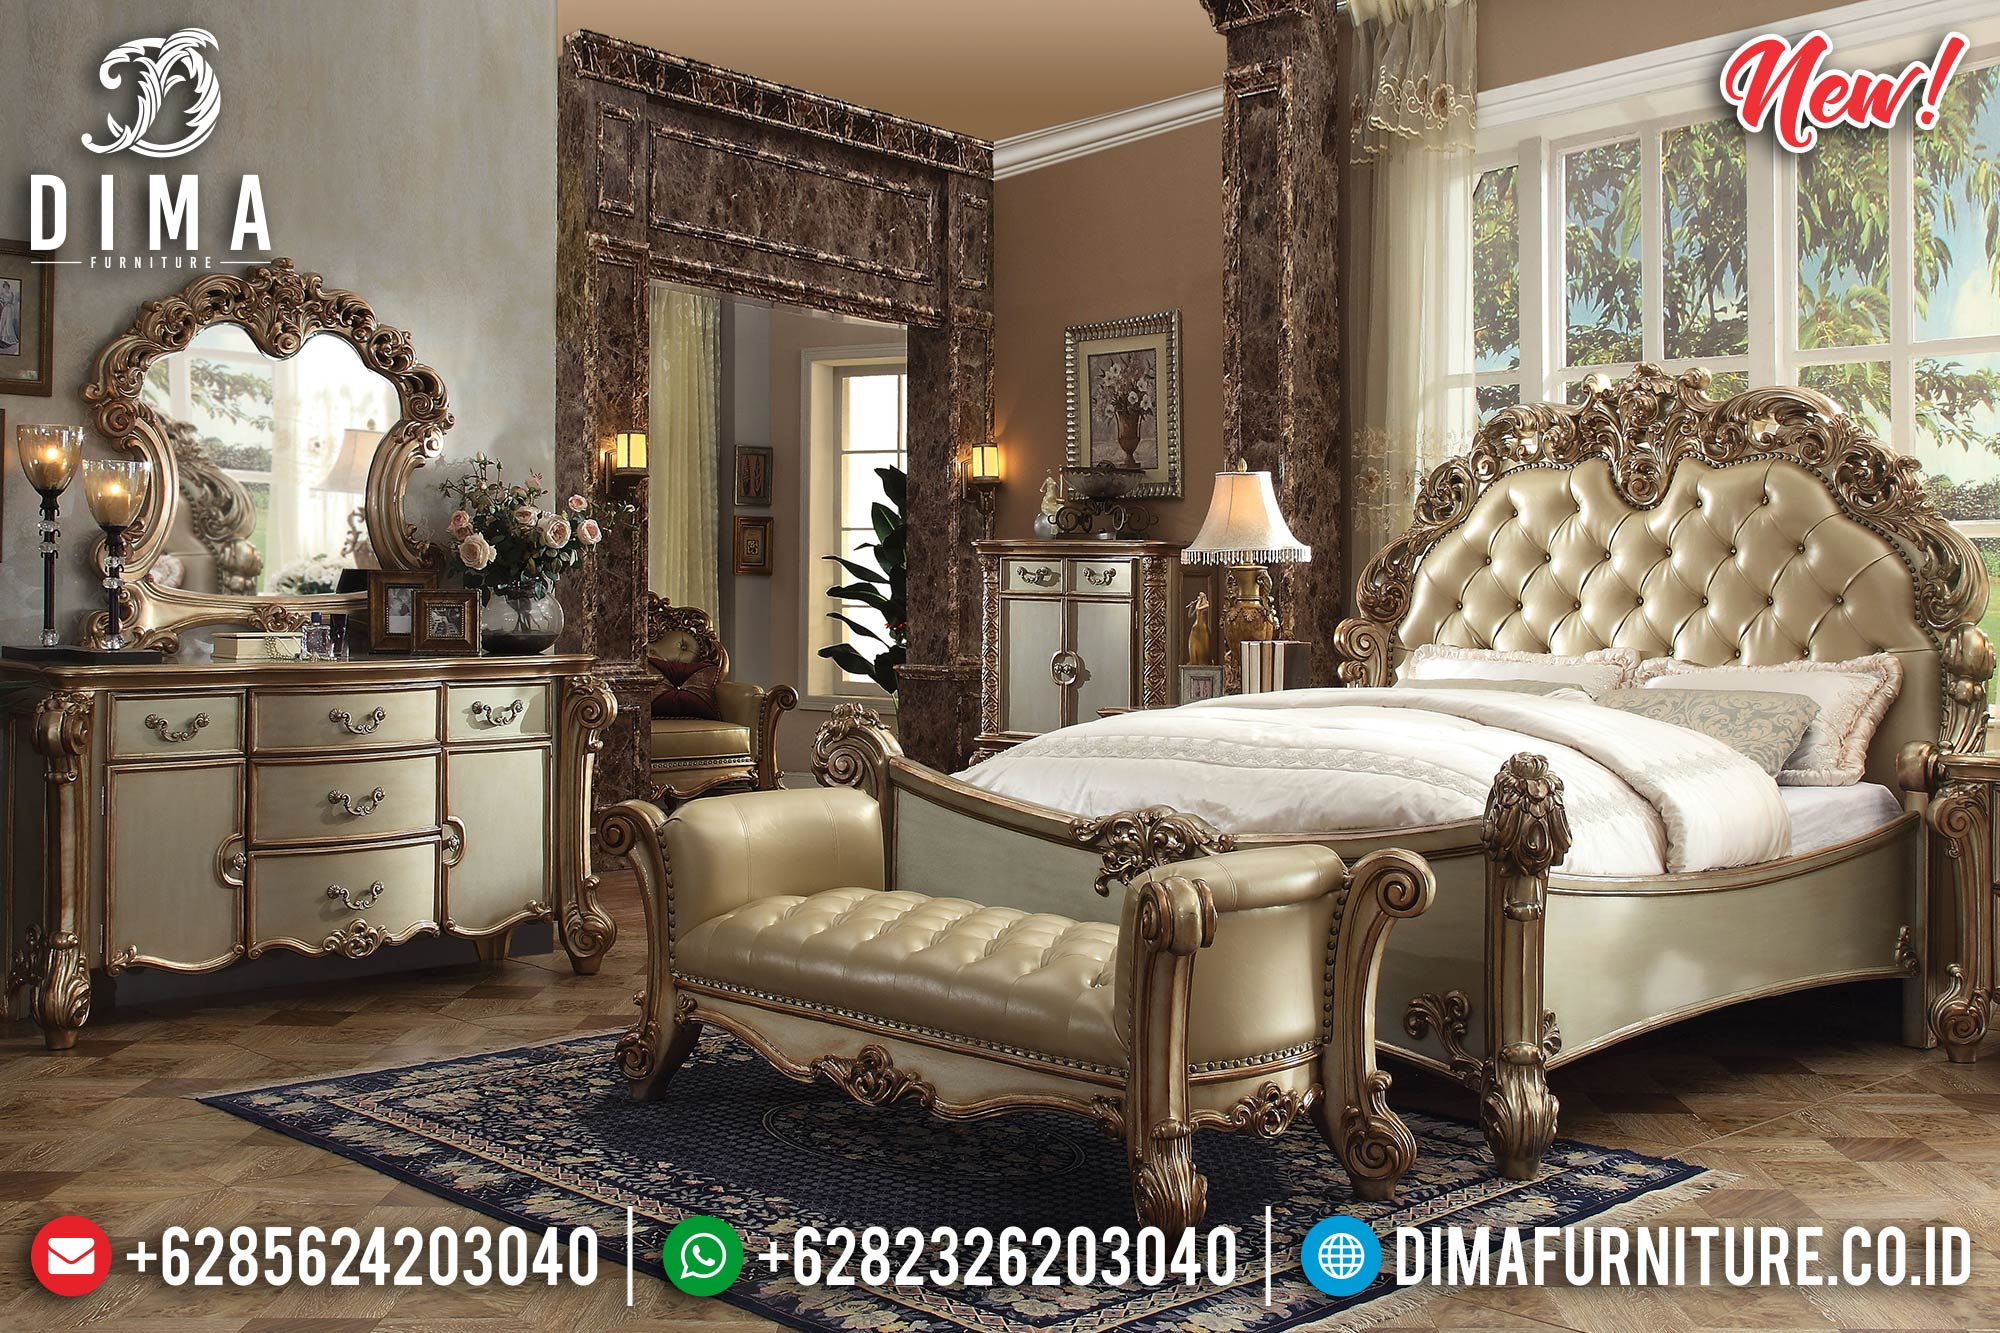 Victorian Classic Tempat Tidur Mewah Ukiran Jepara New Luxury Item TTJ-1231